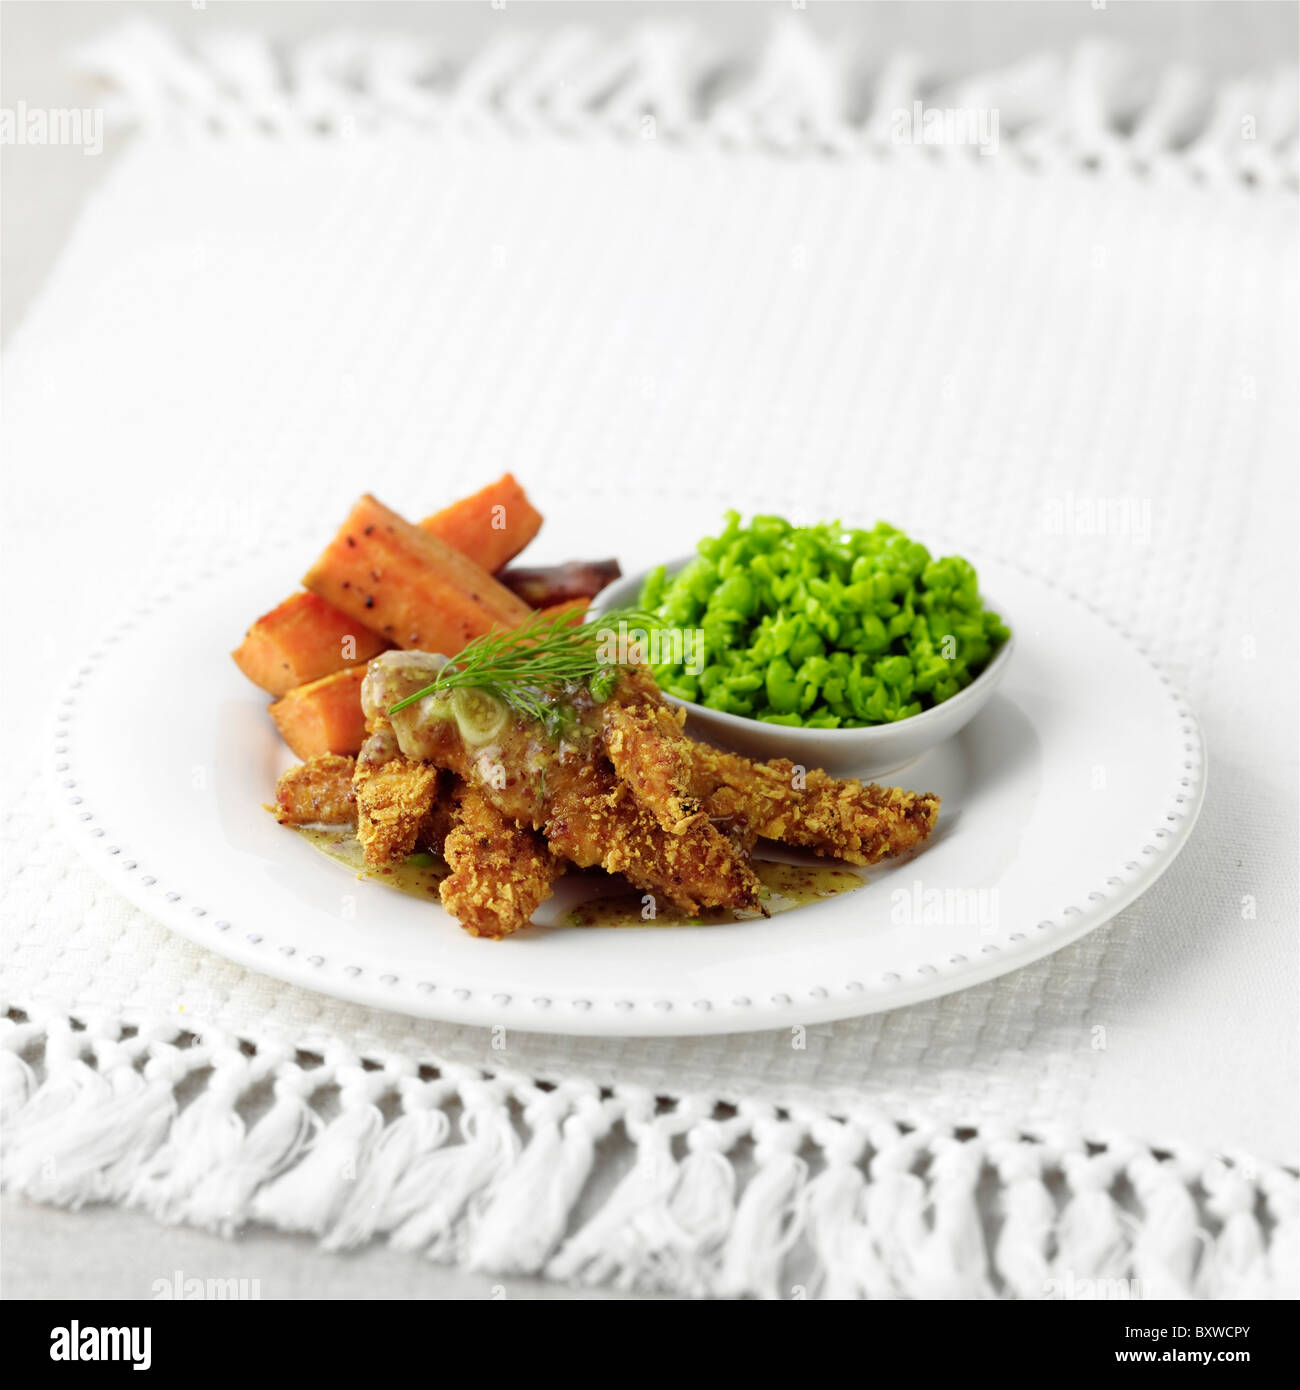 Hähnchen-Coujons mit Honig-Senf-dressing Stockbild